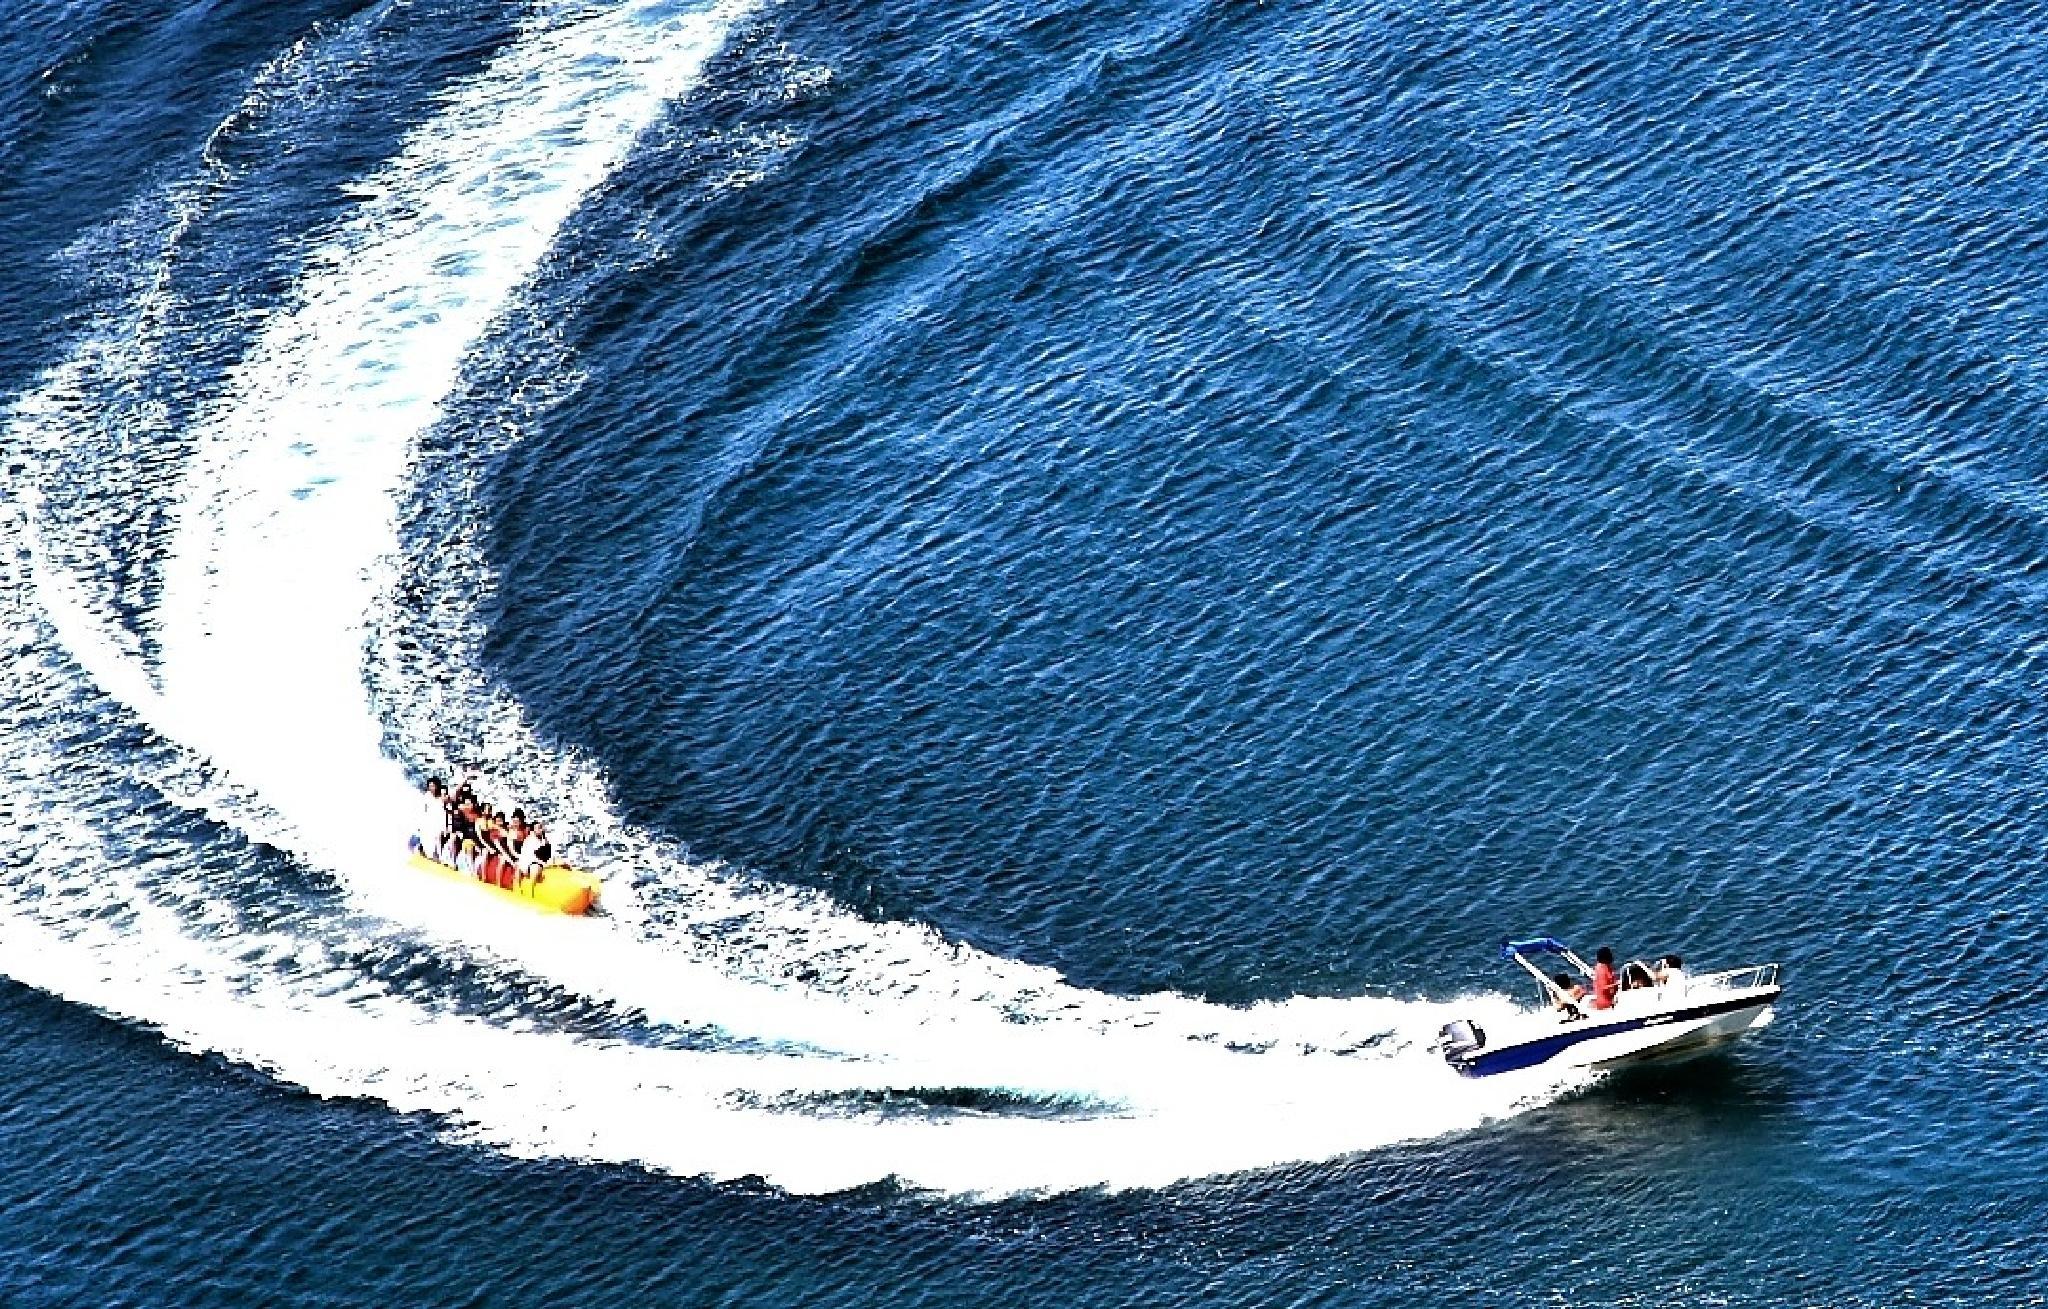 Banana Boat by norman amora